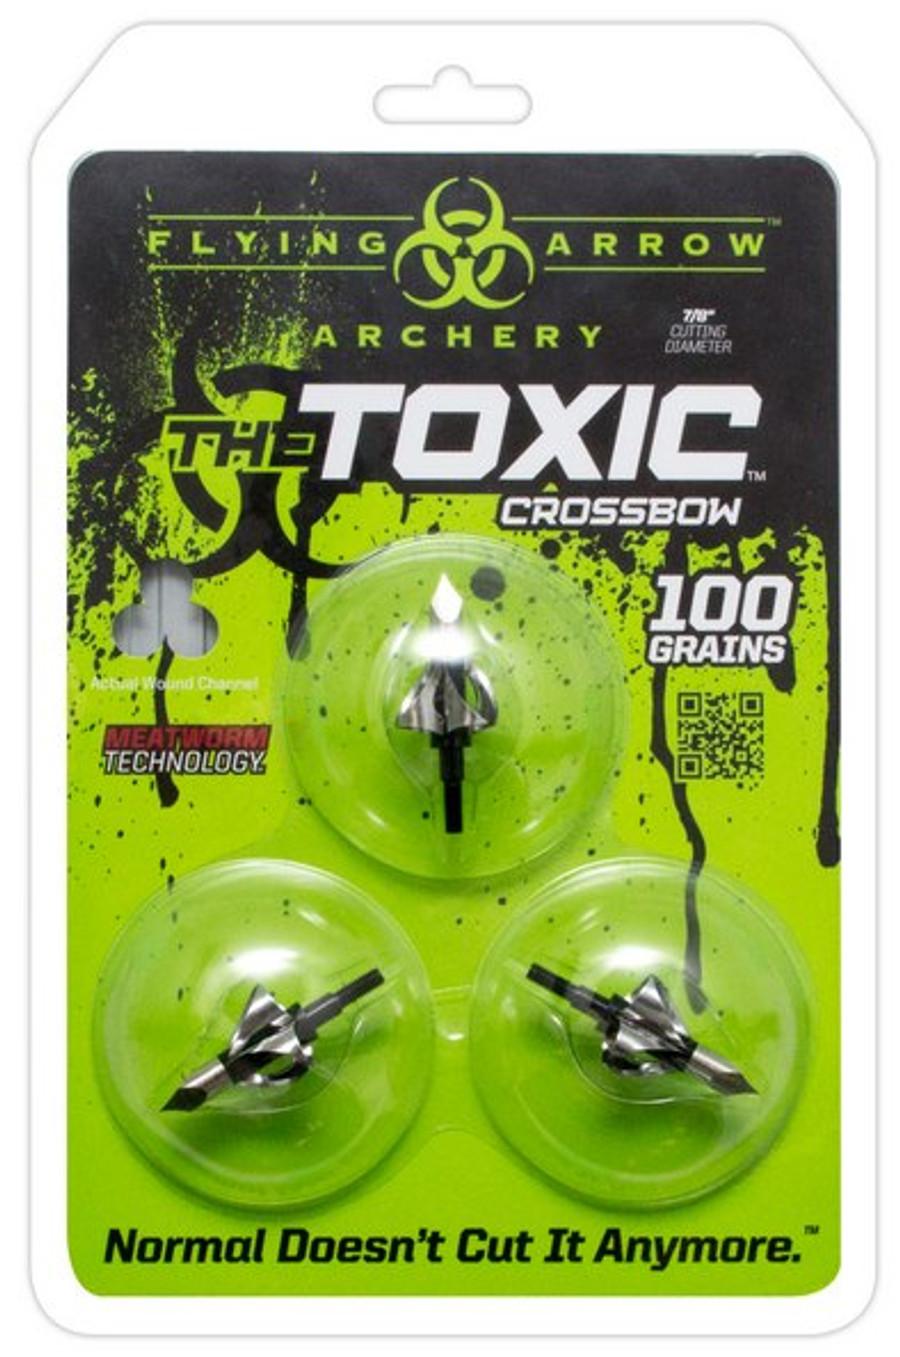 TOXIC 100 GRAIN CROSSBOW MODEL Black